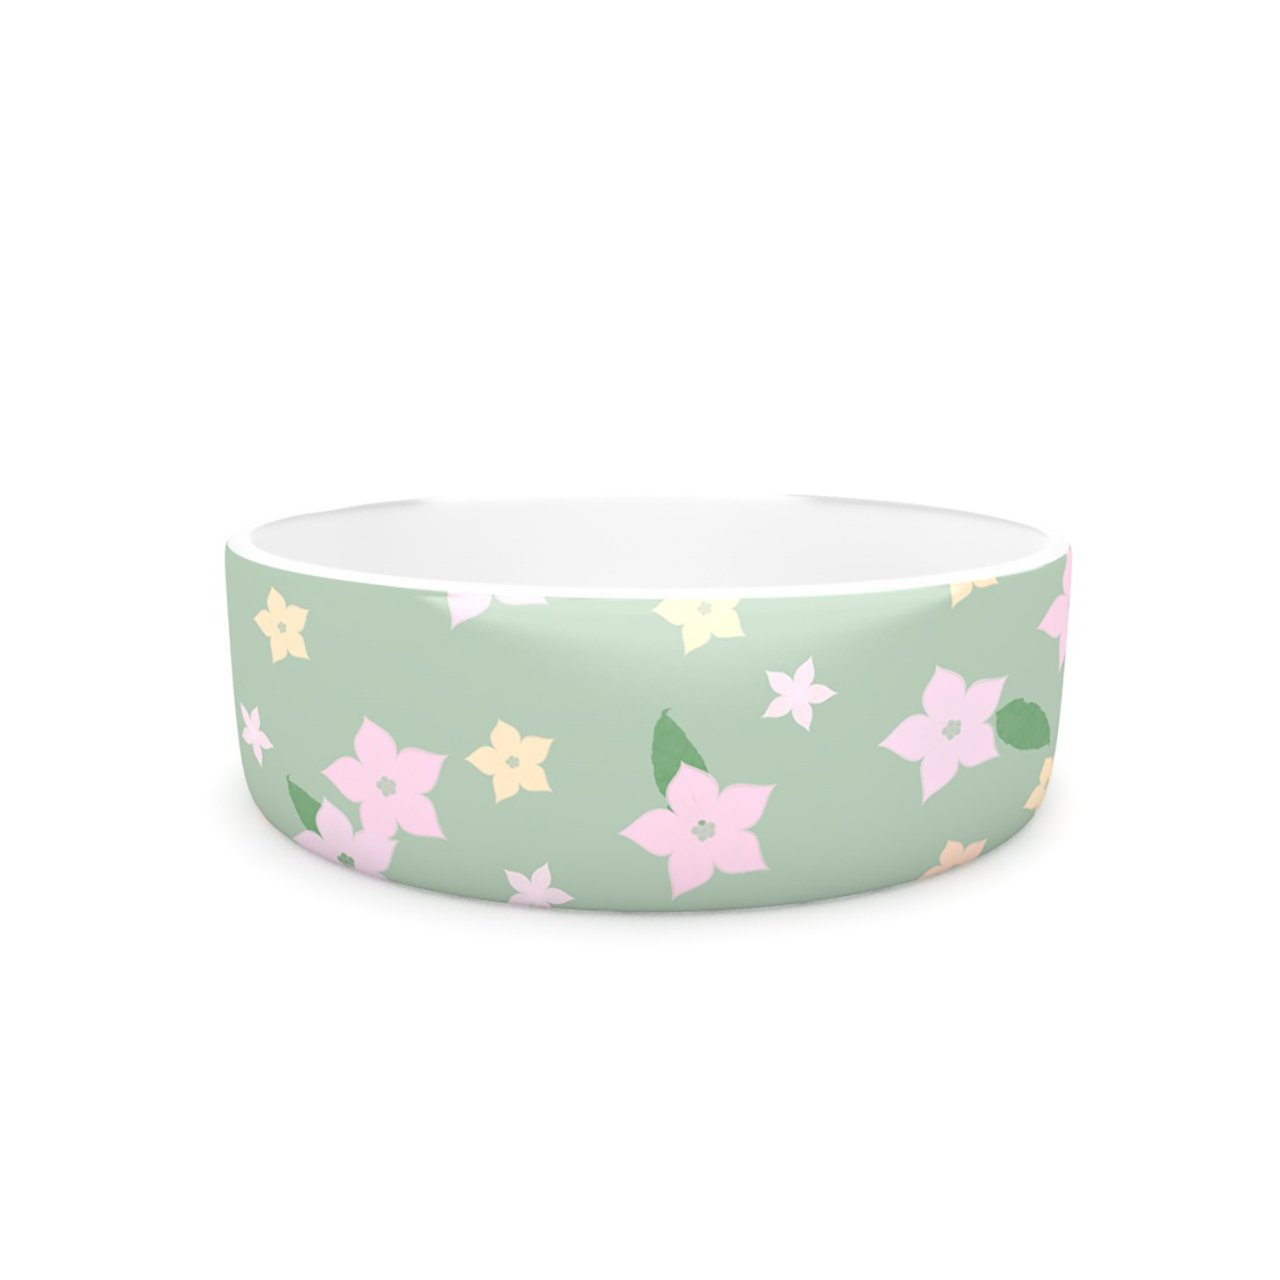 Kess InHouse KESS Original Spring Floral  Pet Bowl, 7-Inch, Green Pink